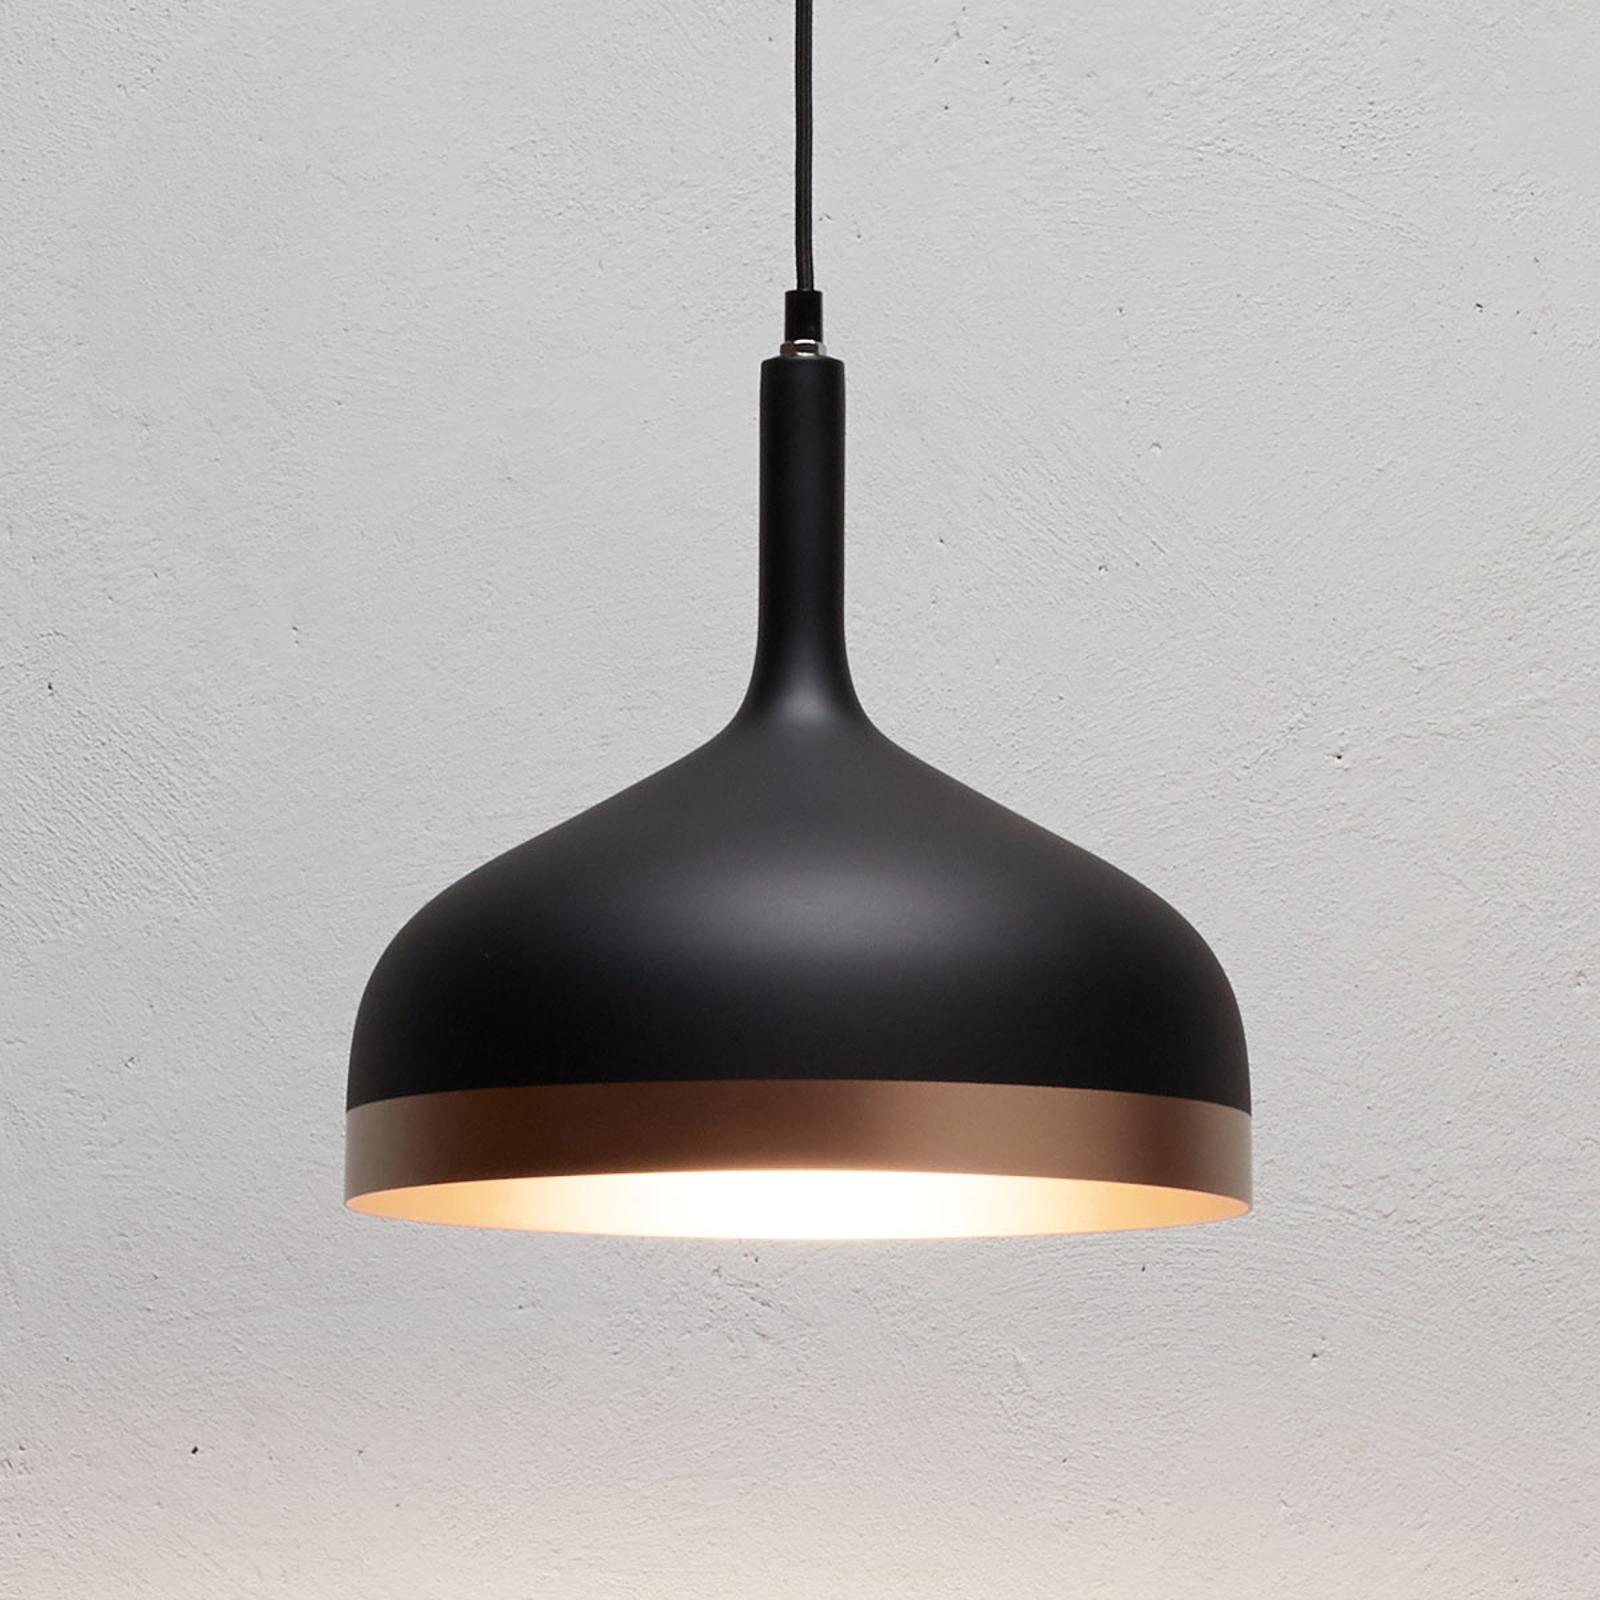 Topmoderne hanglamp Embla in zwart